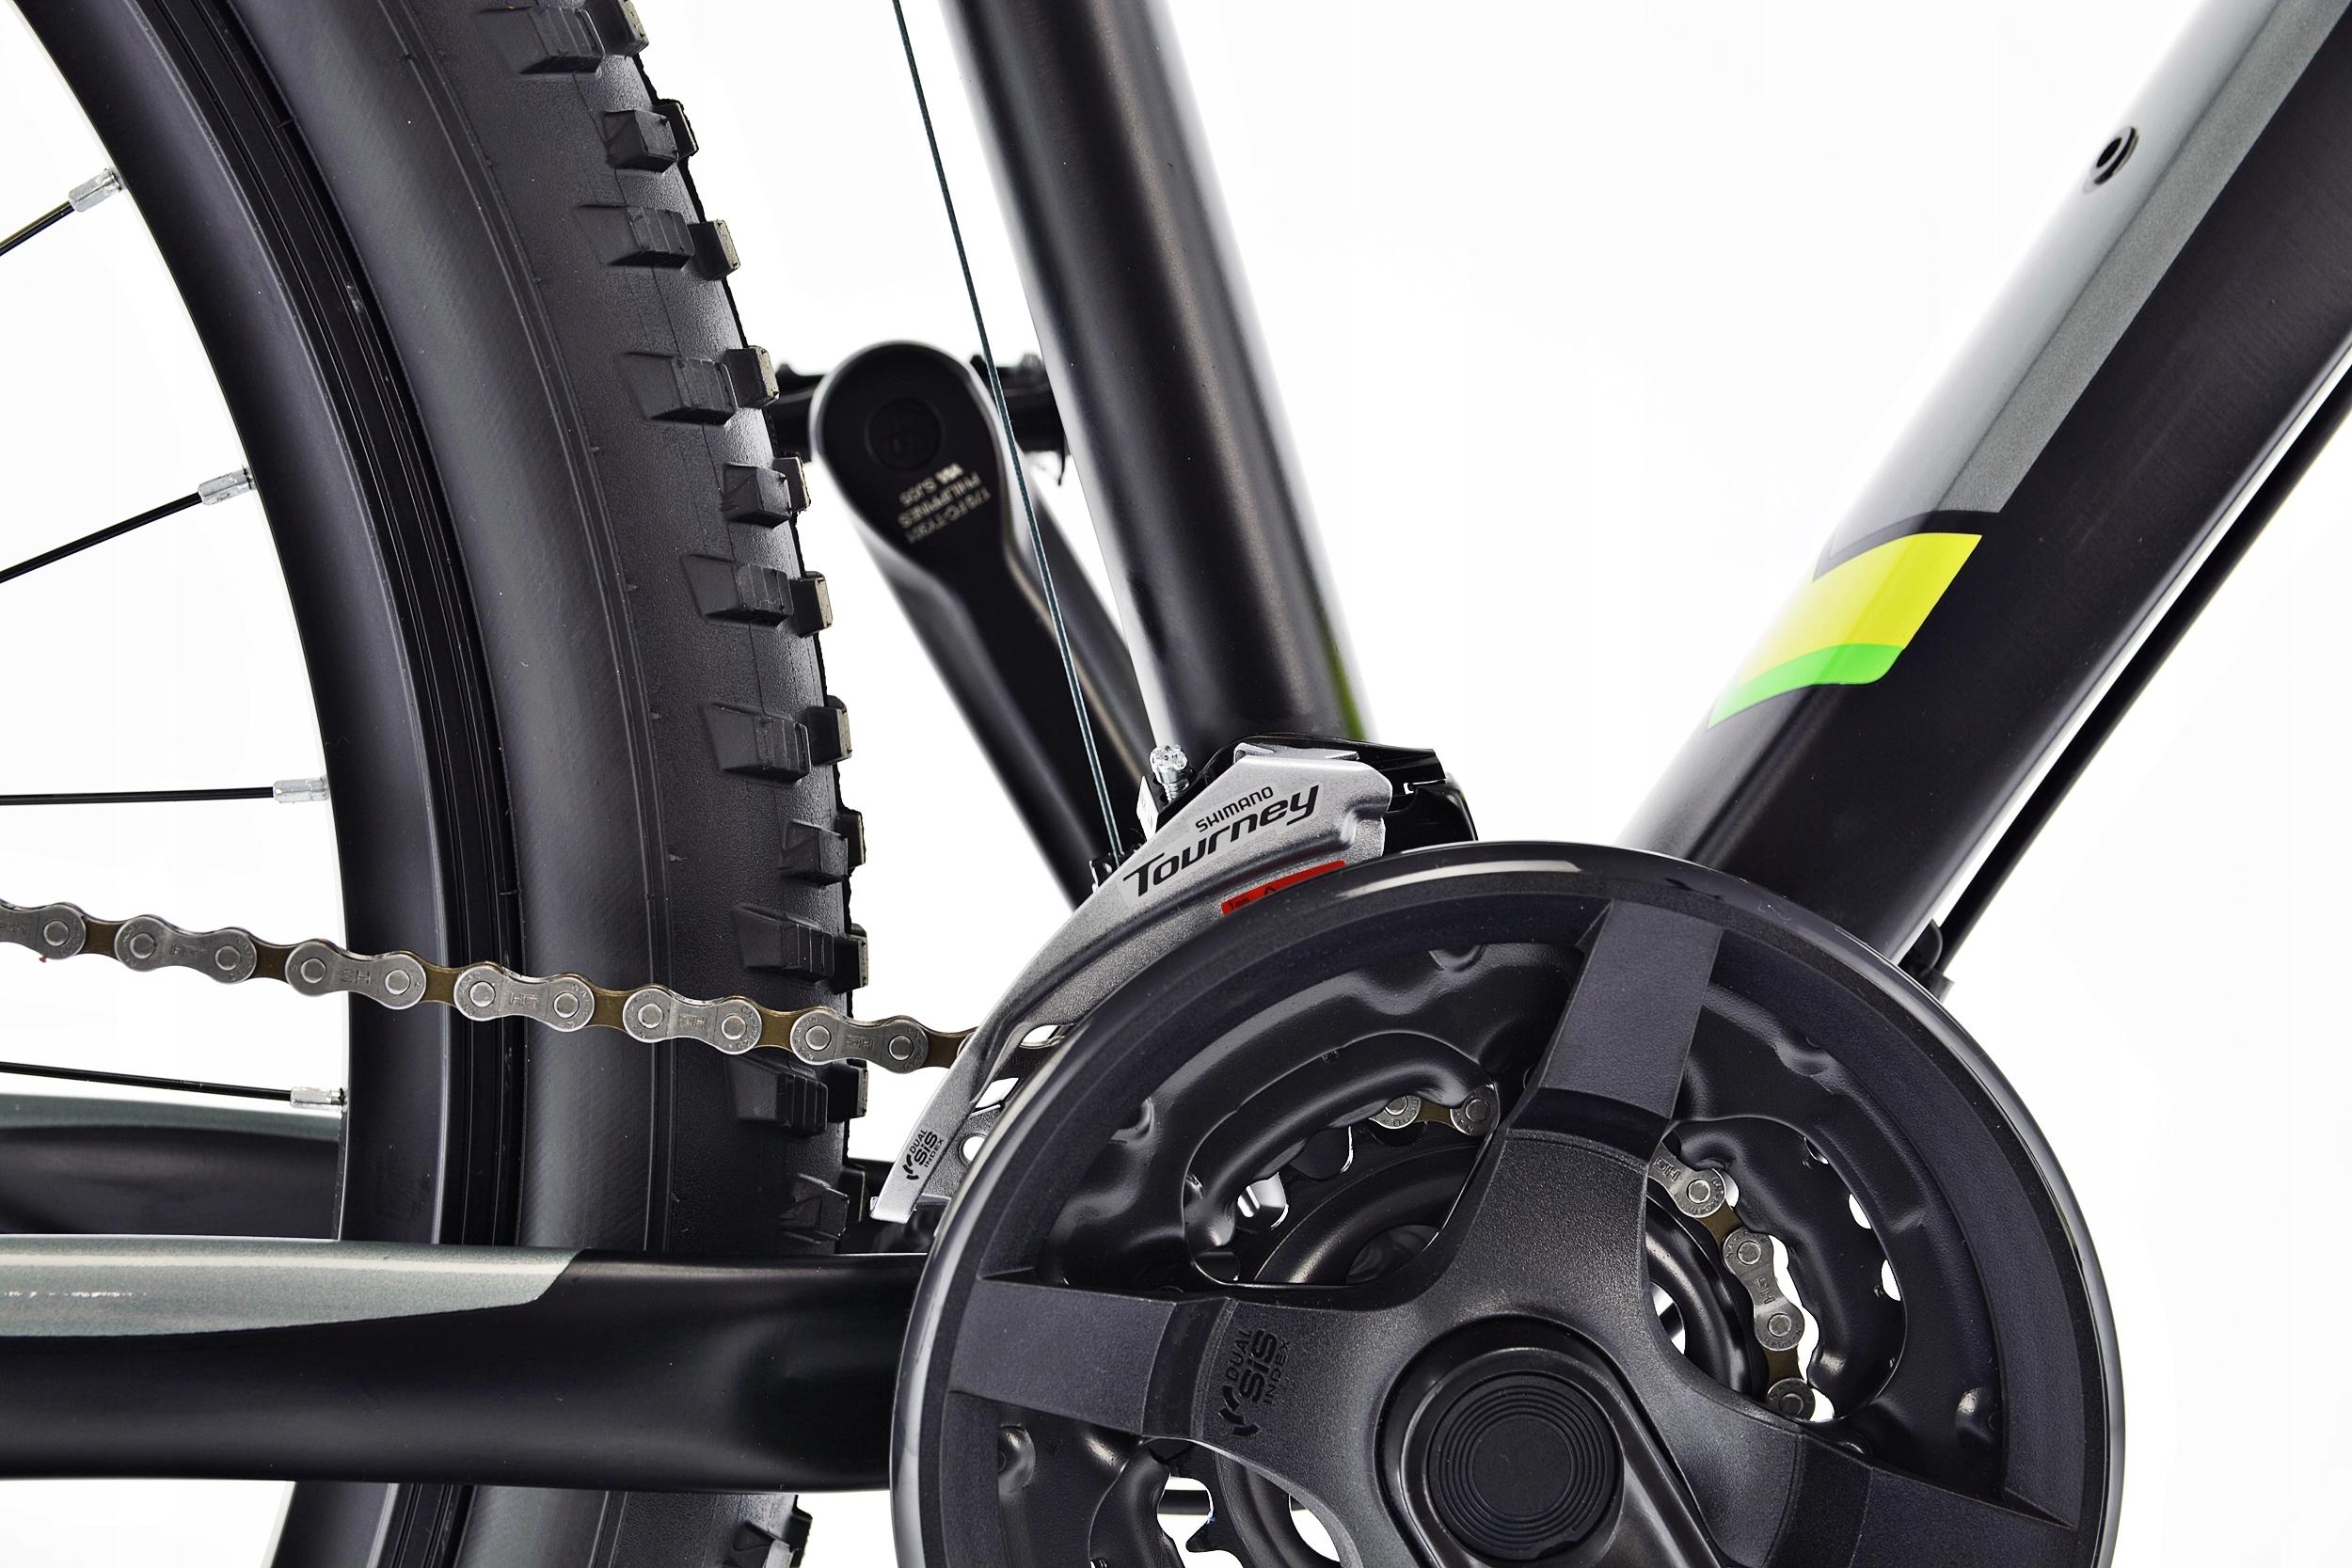 Rower MTB Kands 29 COMPER 21 czarno-seled 2021 Materiał ramy aluminium